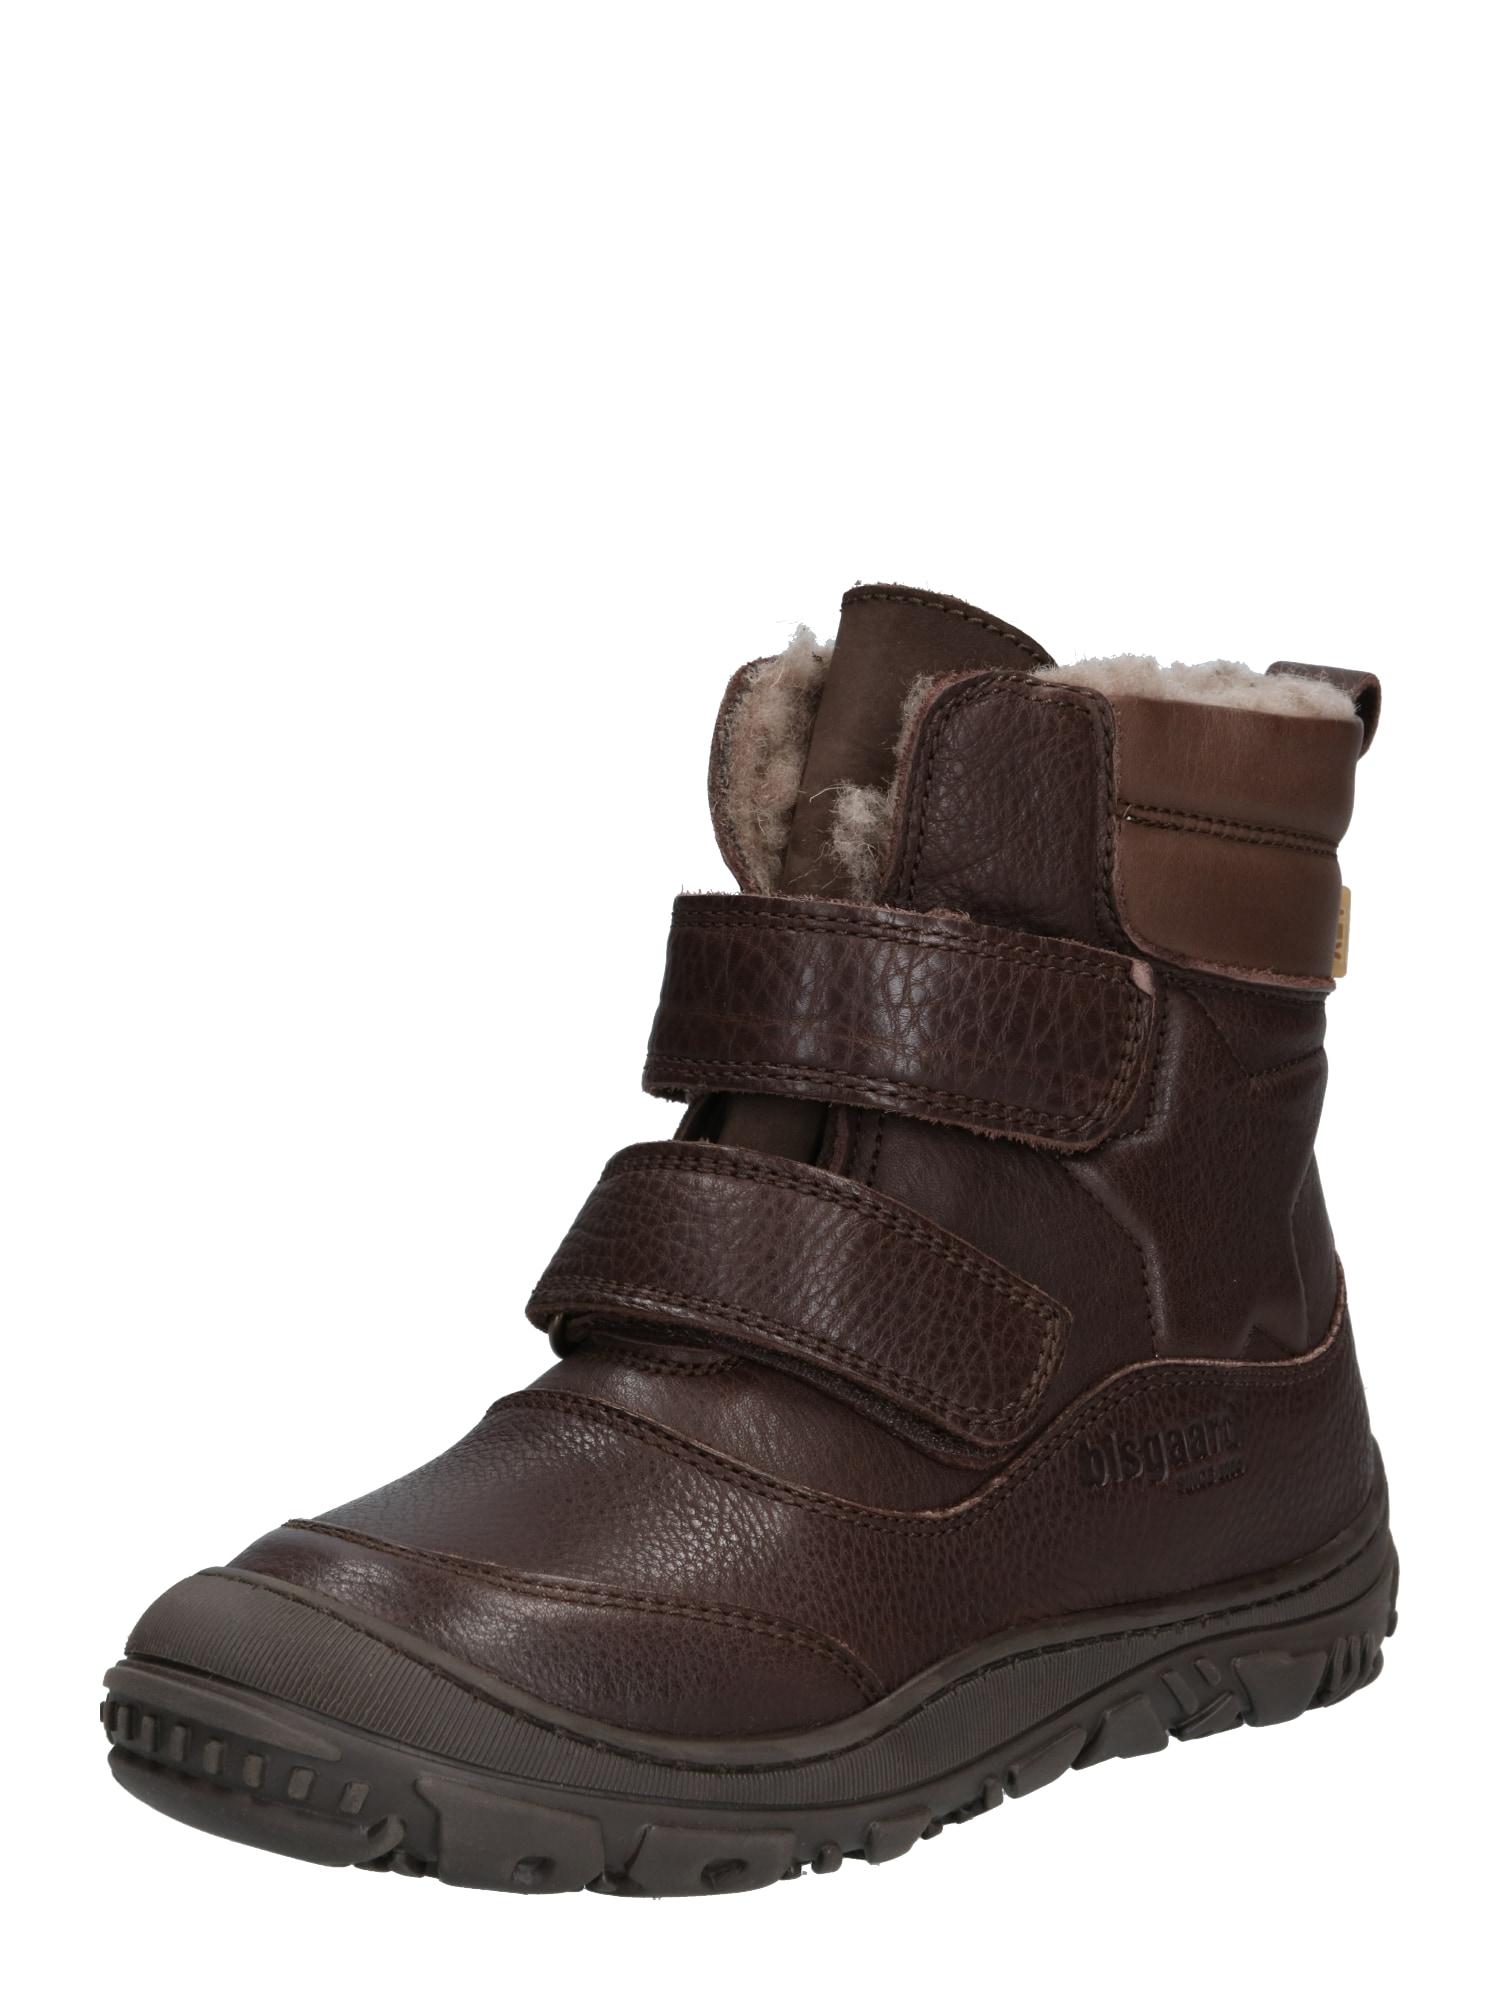 BISGAARD Auliniai batai su kulniuku 'TEX' ruda